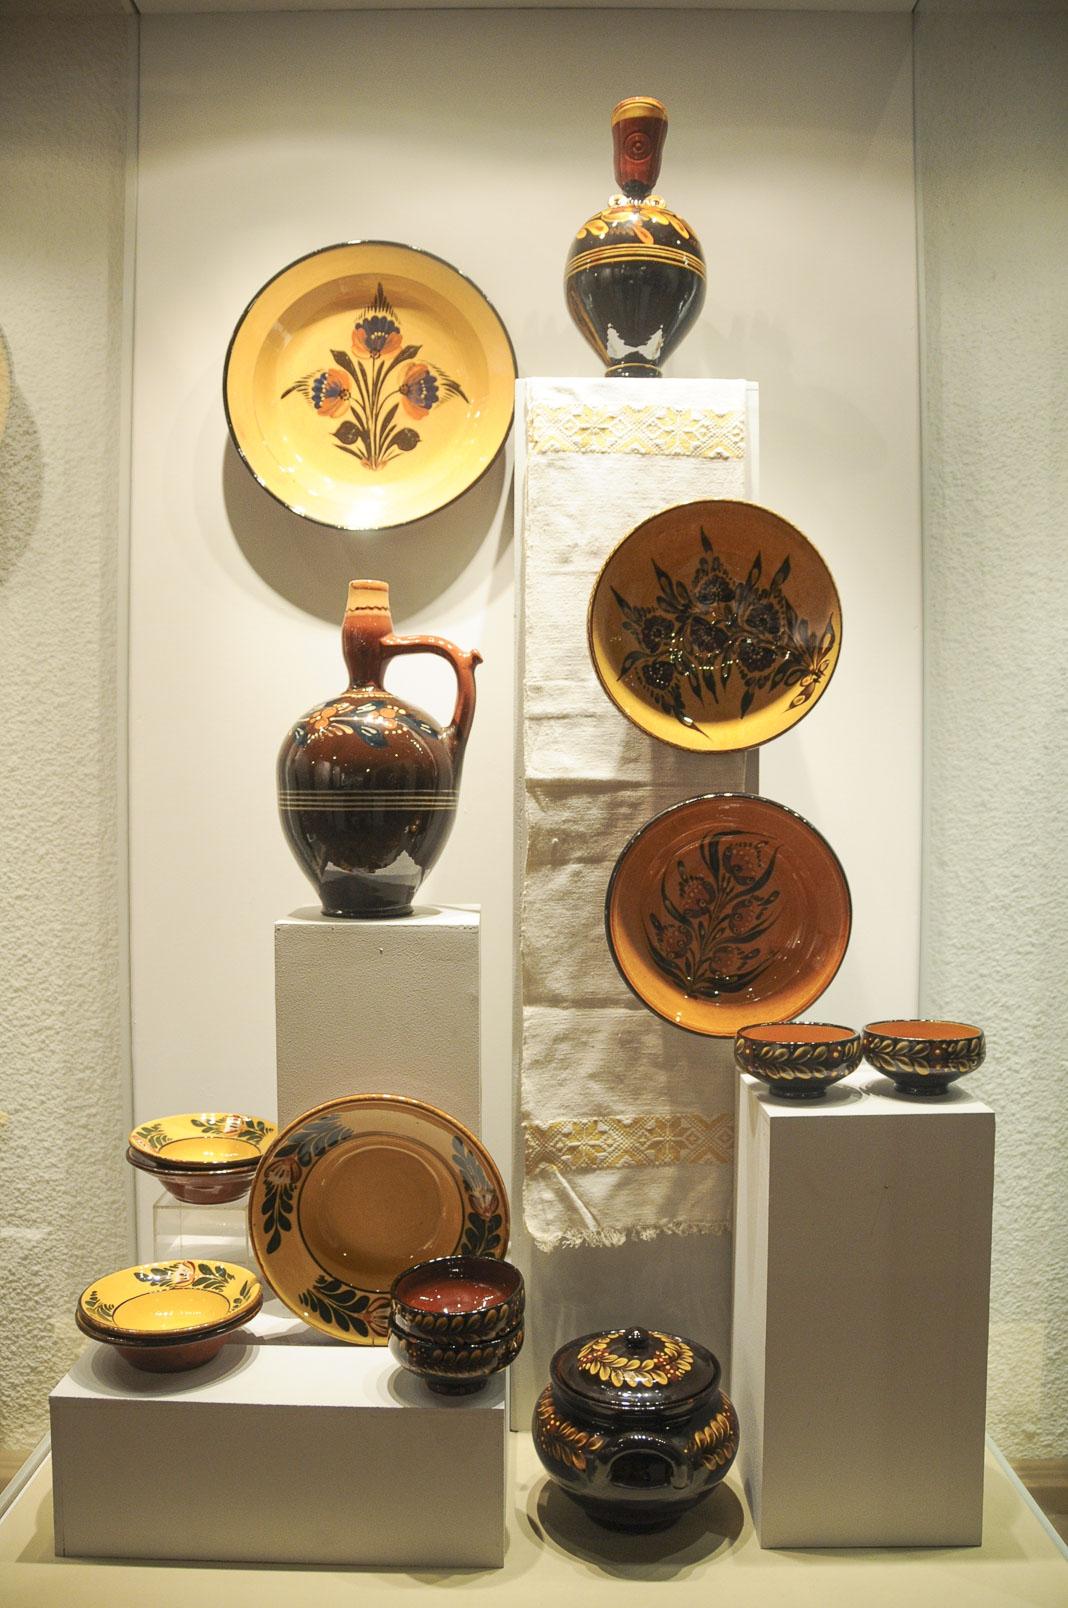 troyan-museum-cvetqta-na-zografa-21